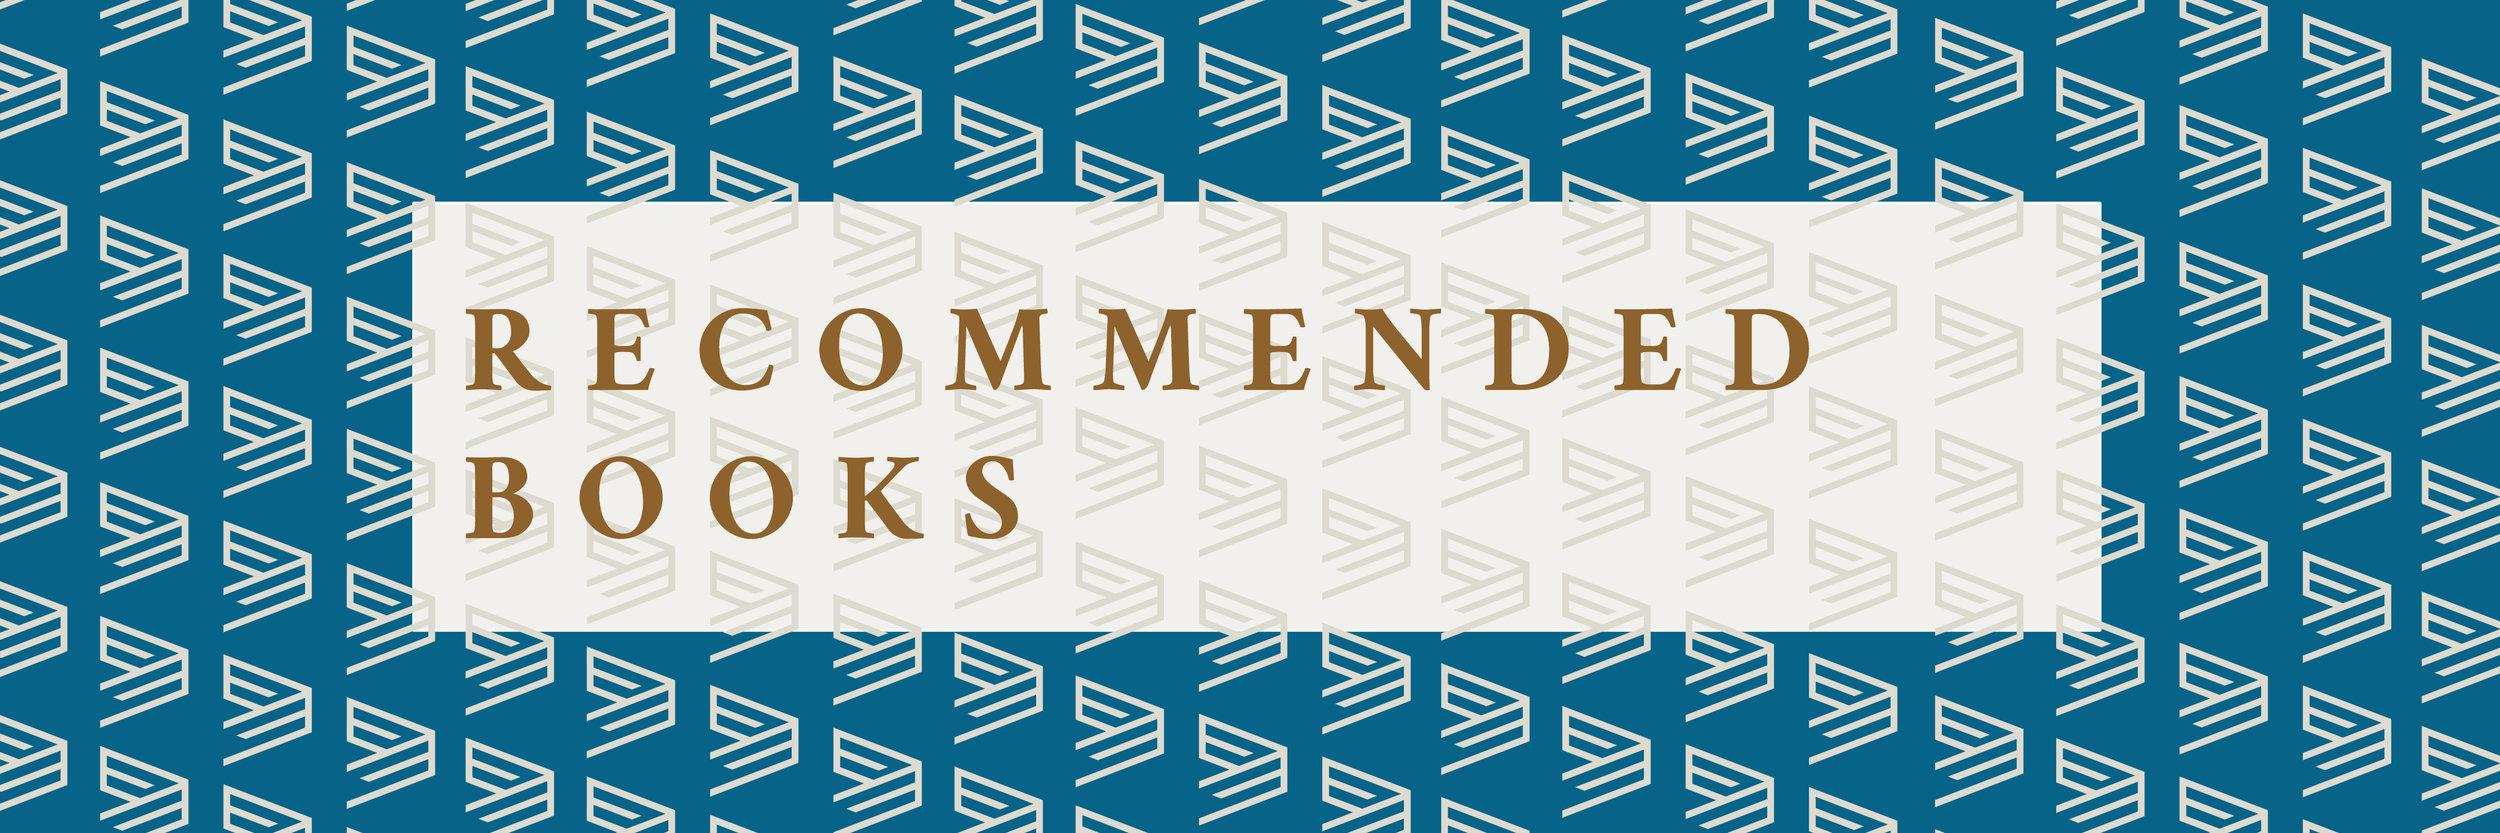 Recommended books.jpg